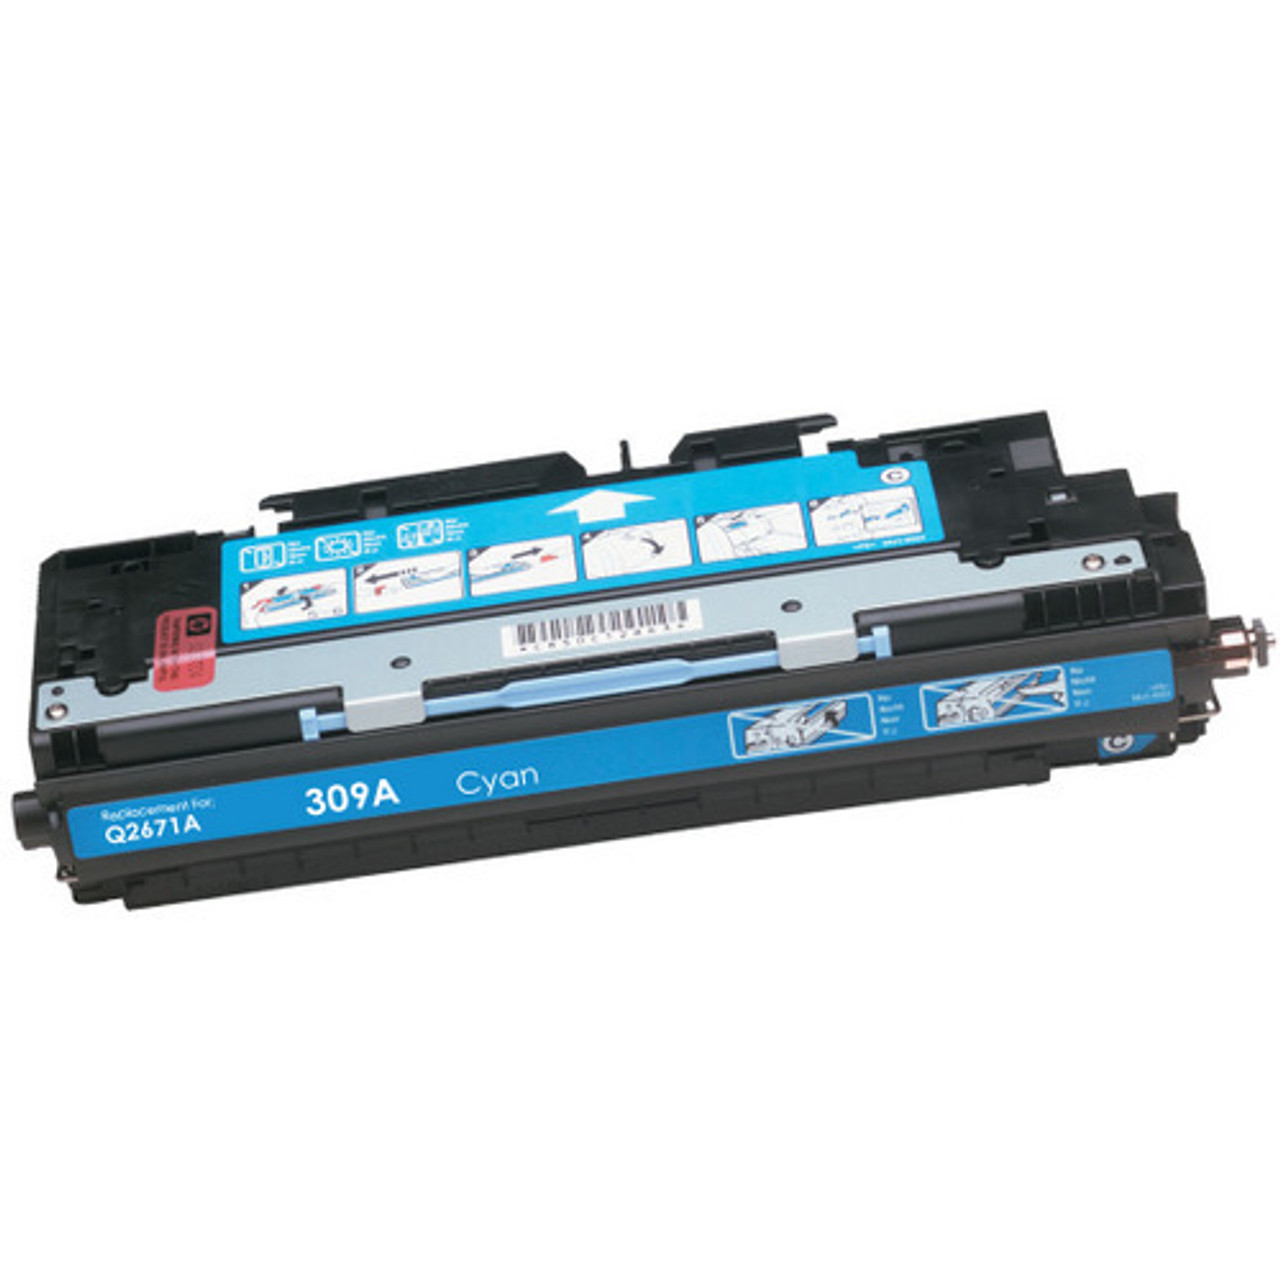 HP Laserjet 309A 3500 3500n 3550 3550n Toner Cartridge Set